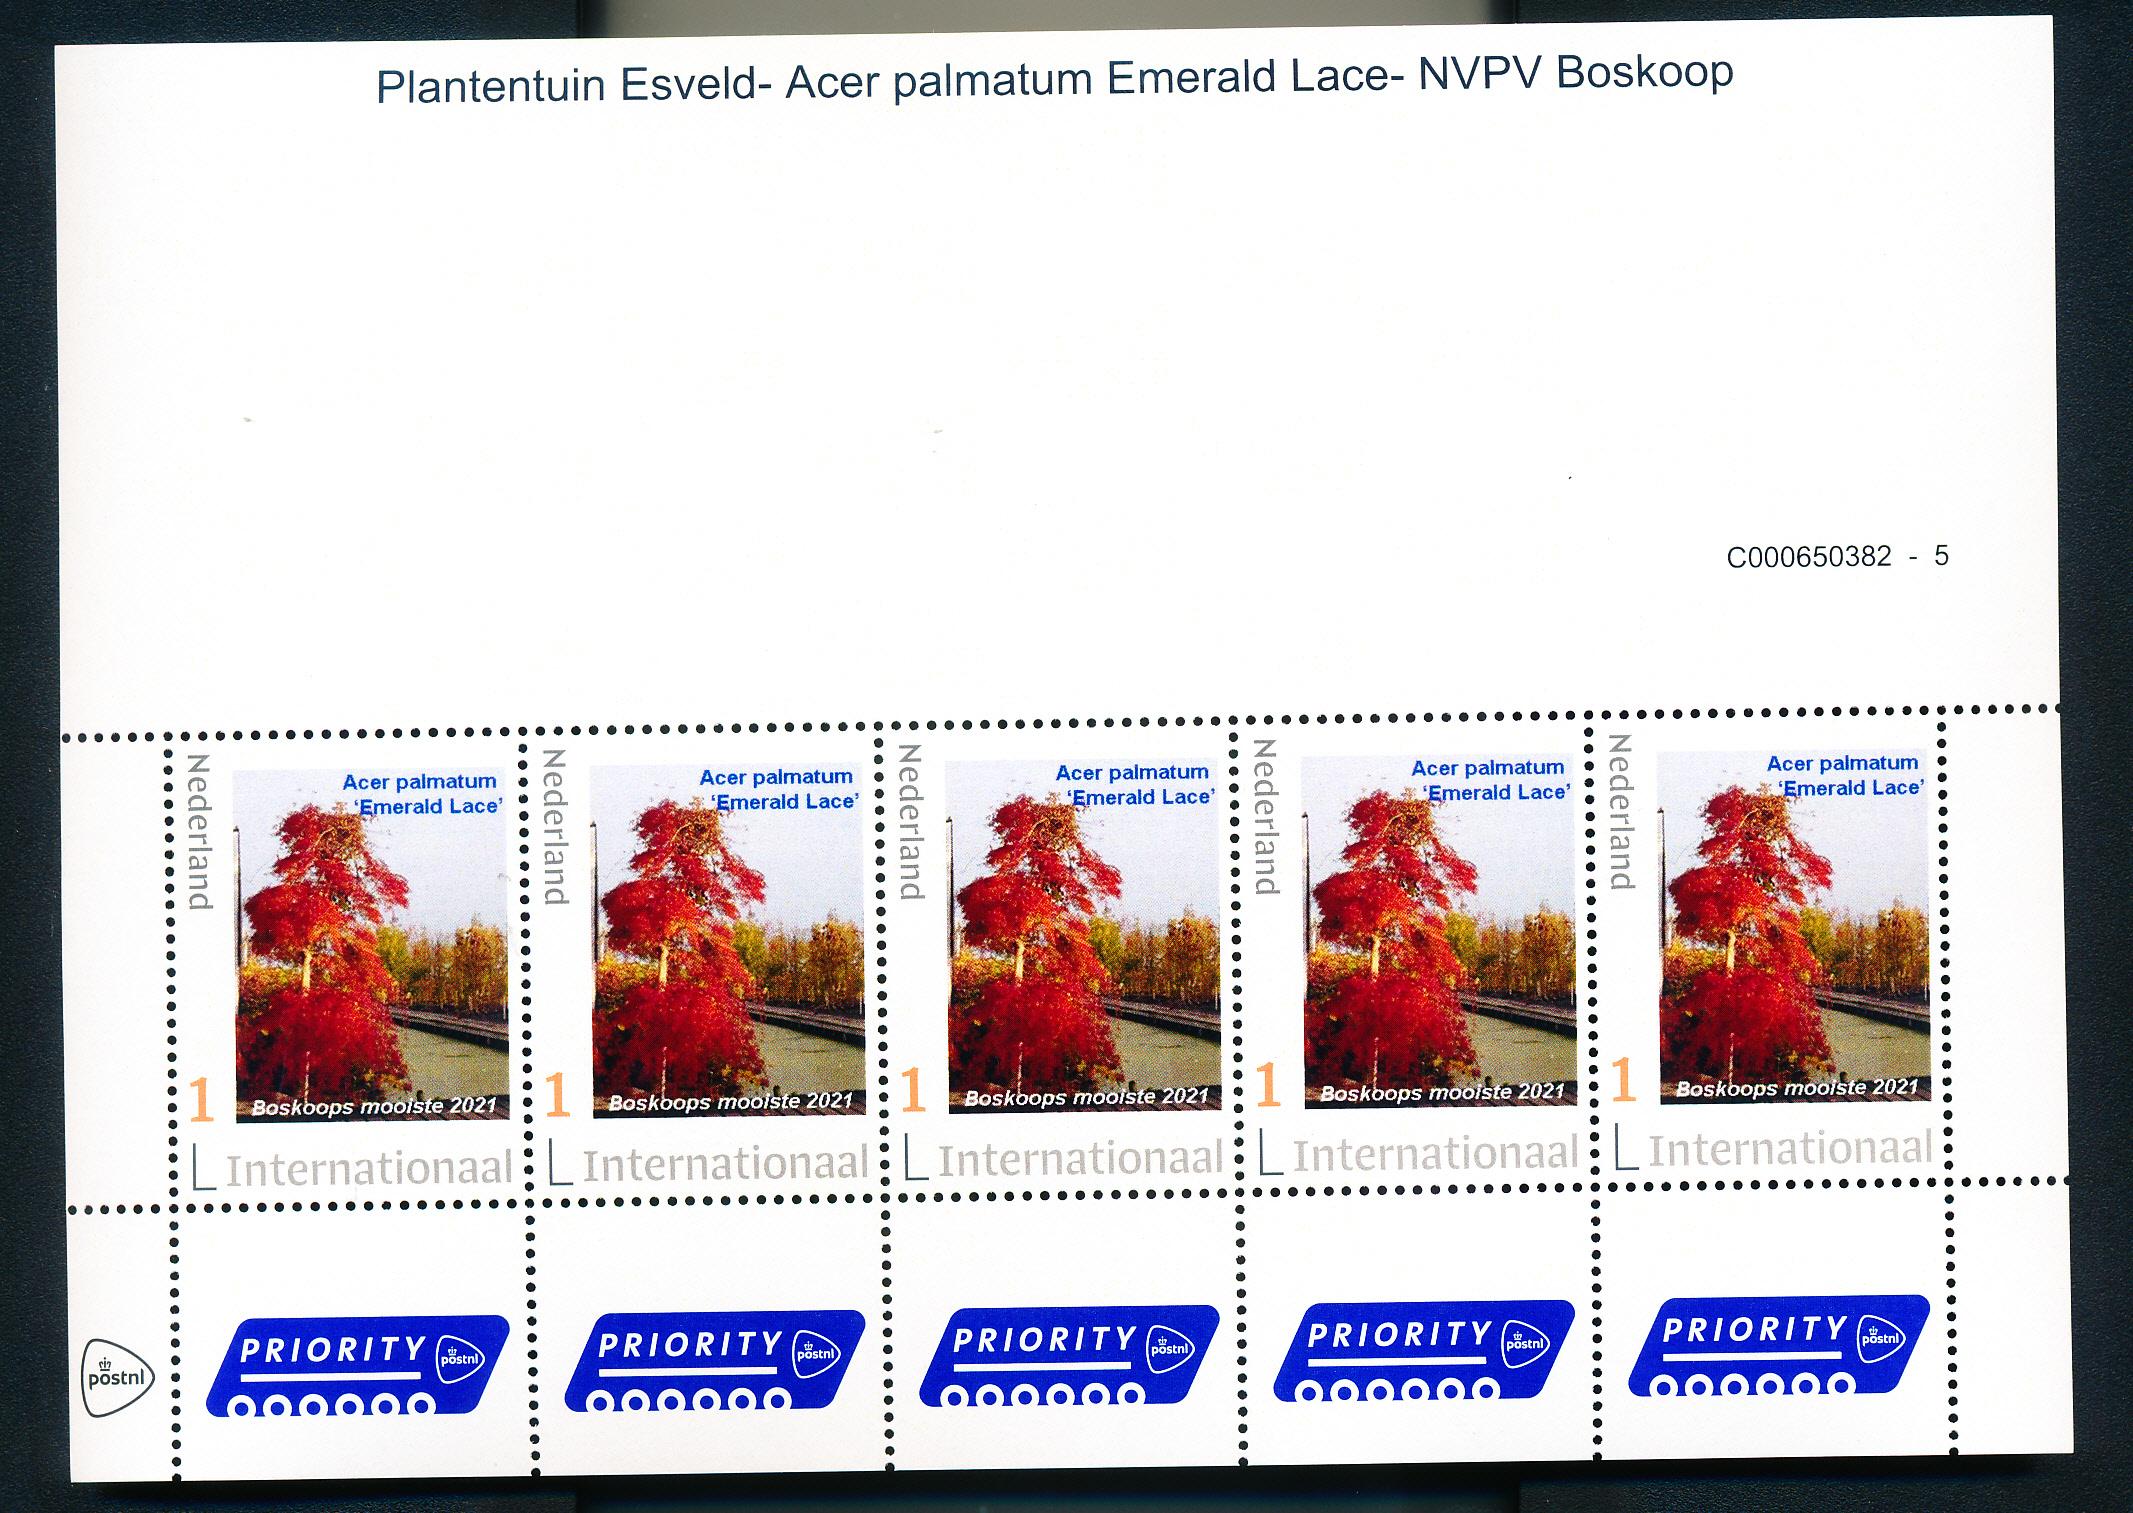 Postzegel Intern. Acer p. Emerald Lace